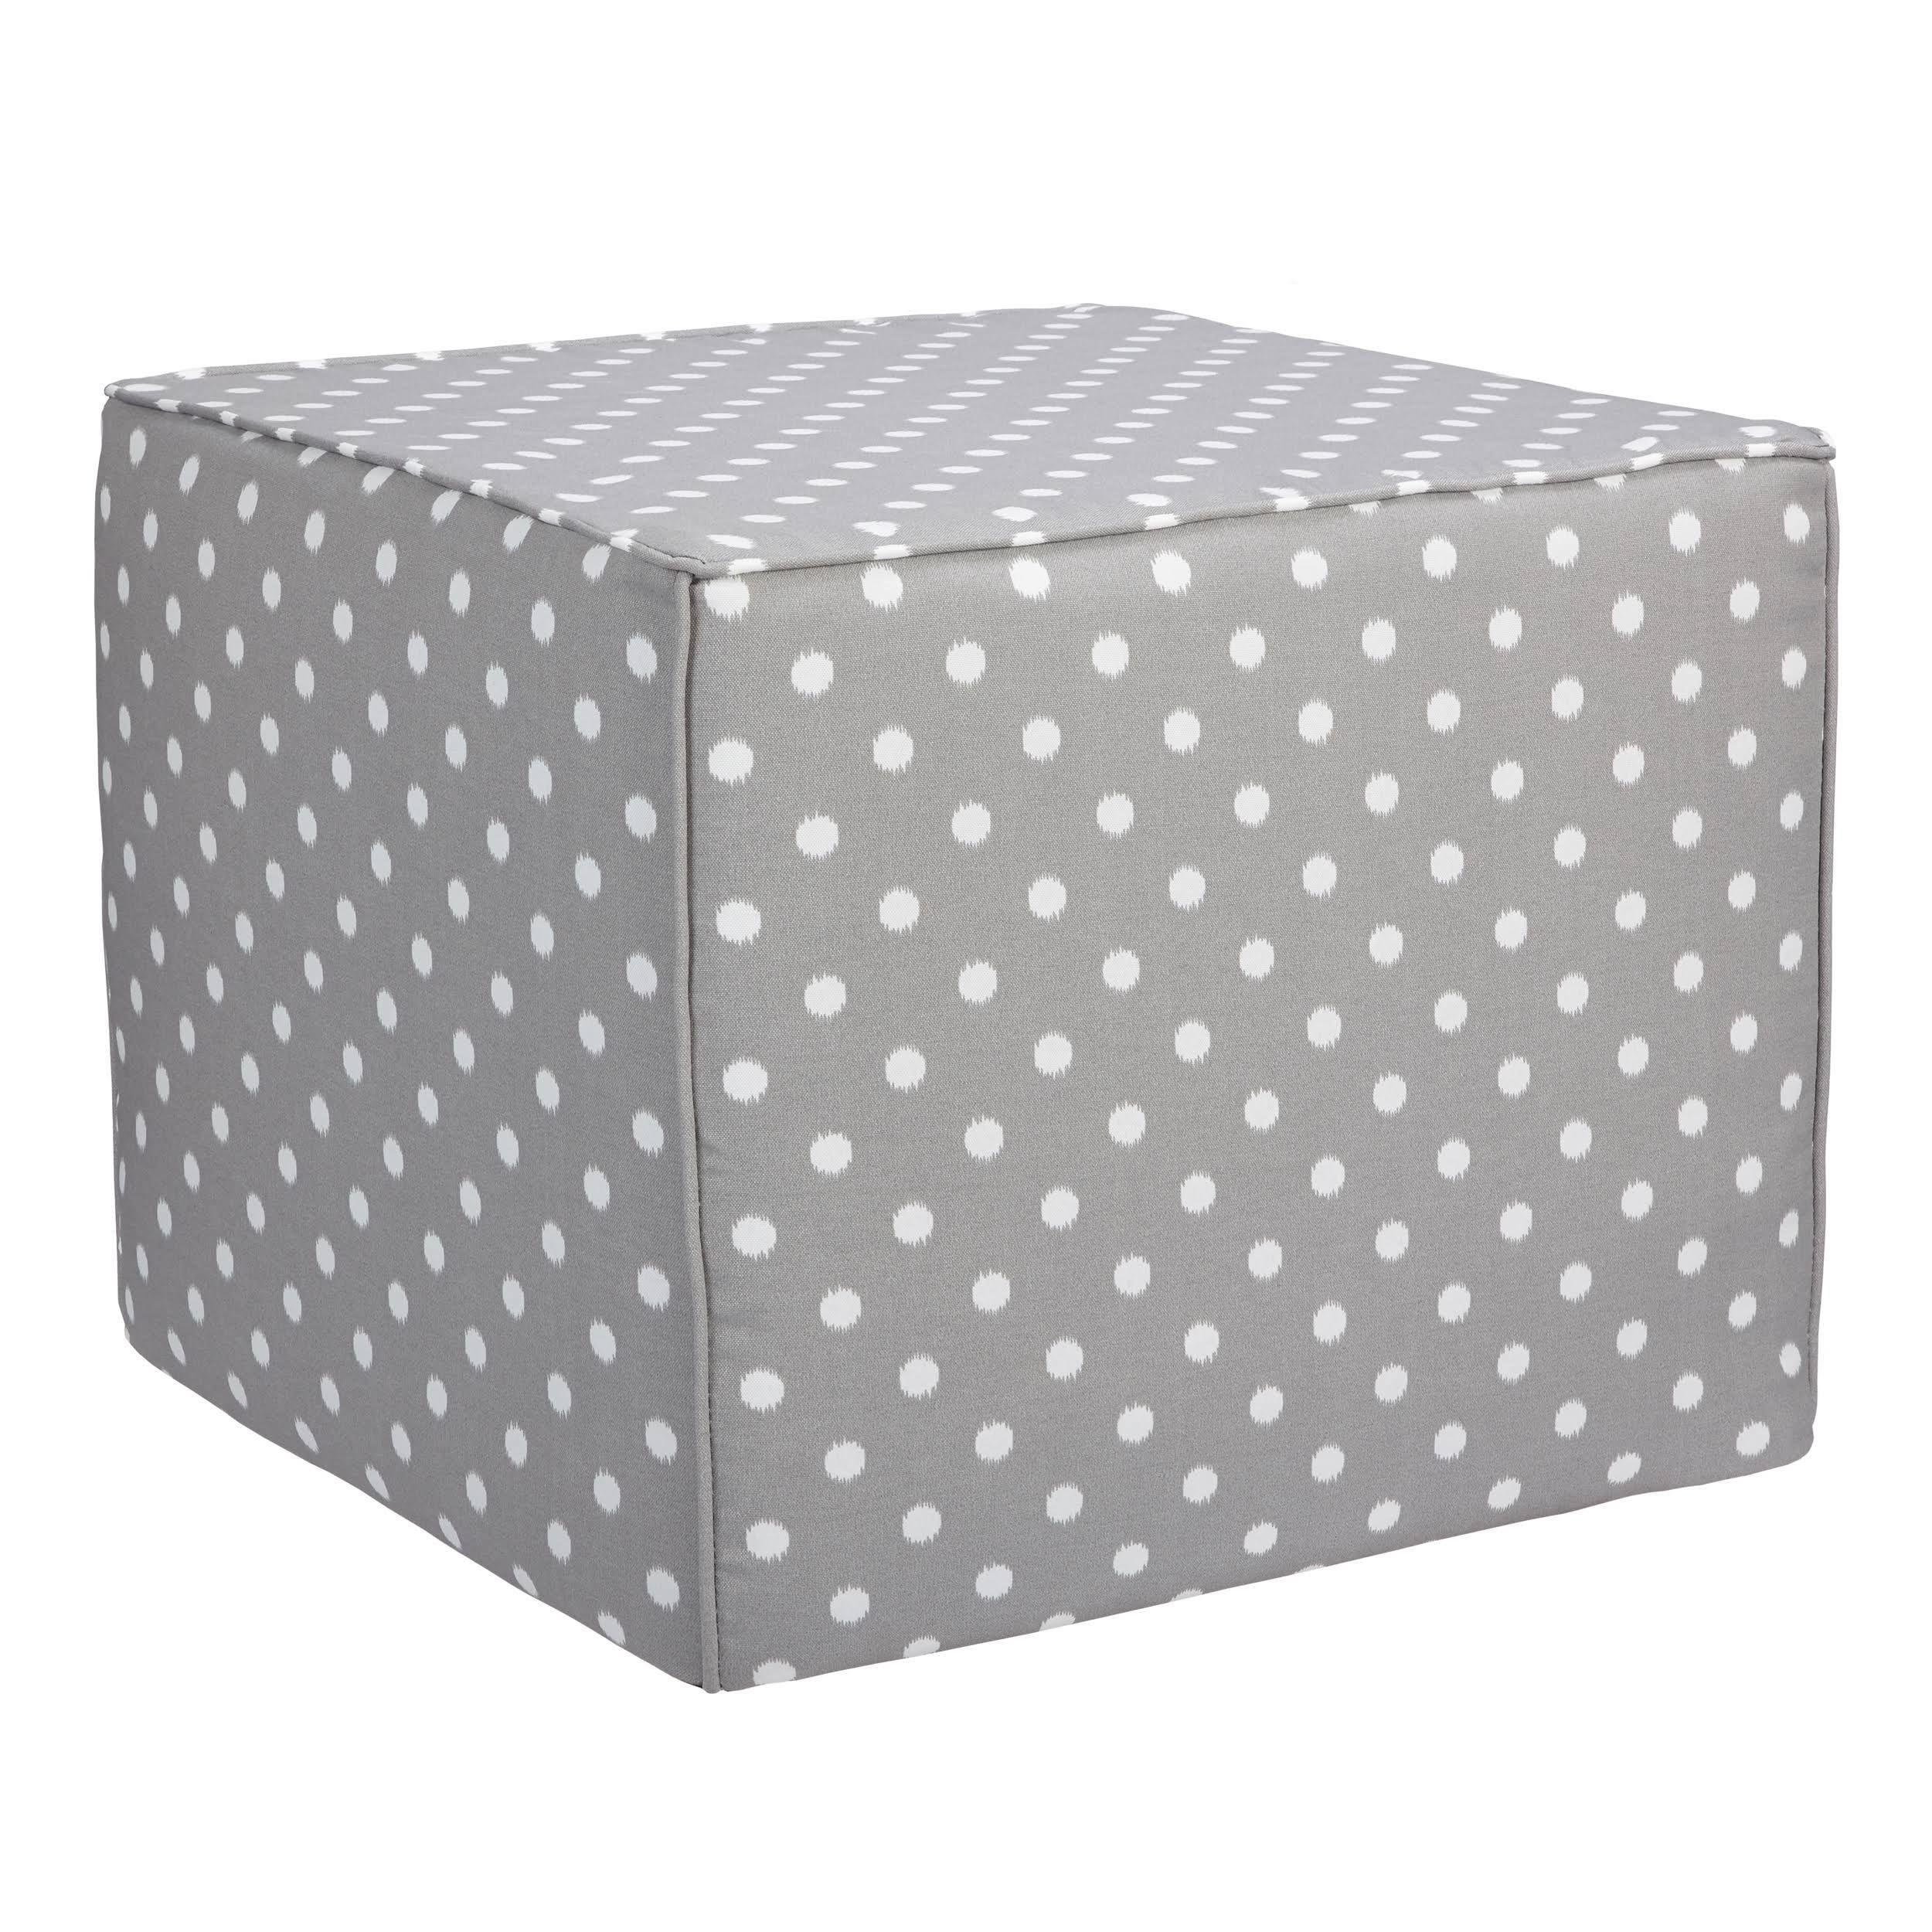 Brooklyn Grey Dots 22-Inch Square Indoor/ Outdoor Ottoman (OSCB2700) (Fabric), Outdoor Cushion